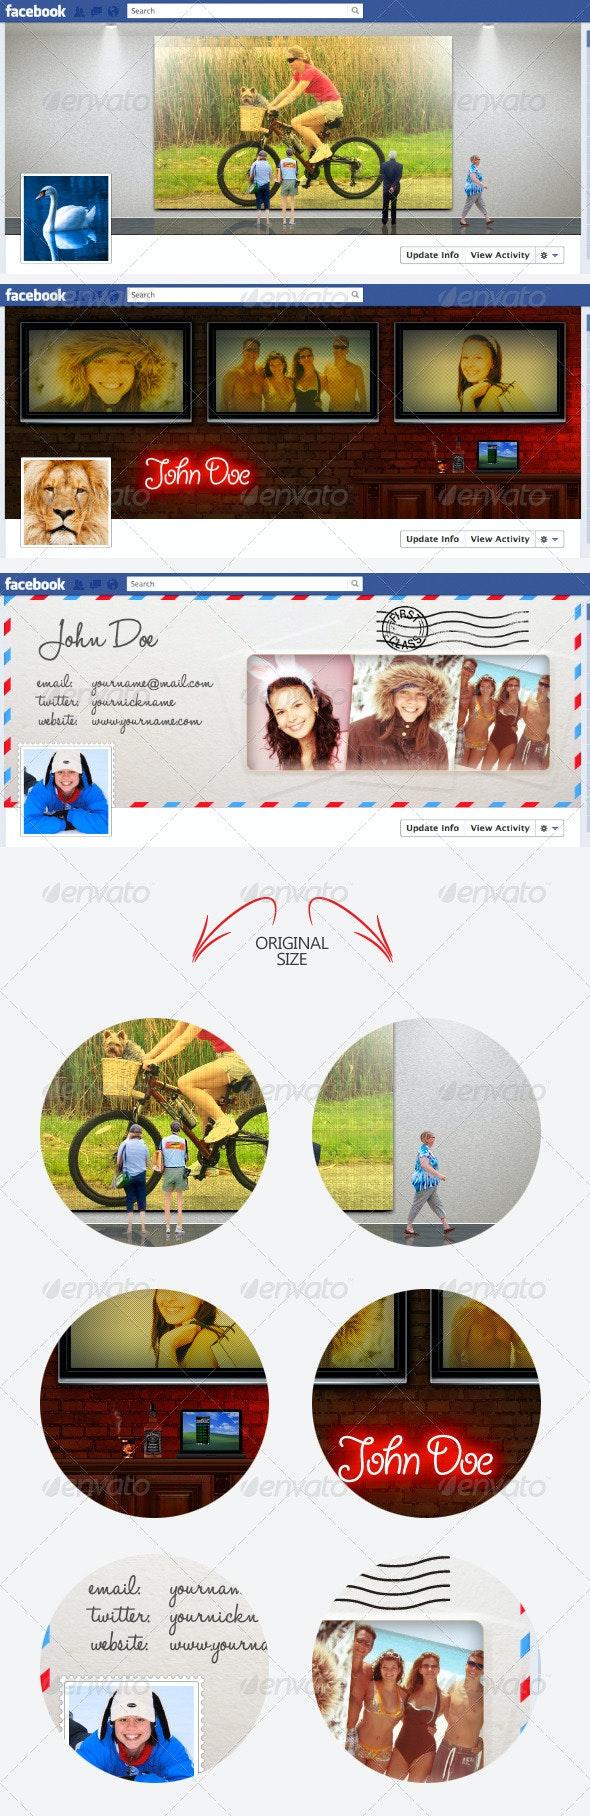 3 Creative Timeline Covers for Facebook - Facebook Timeline Covers Social Media